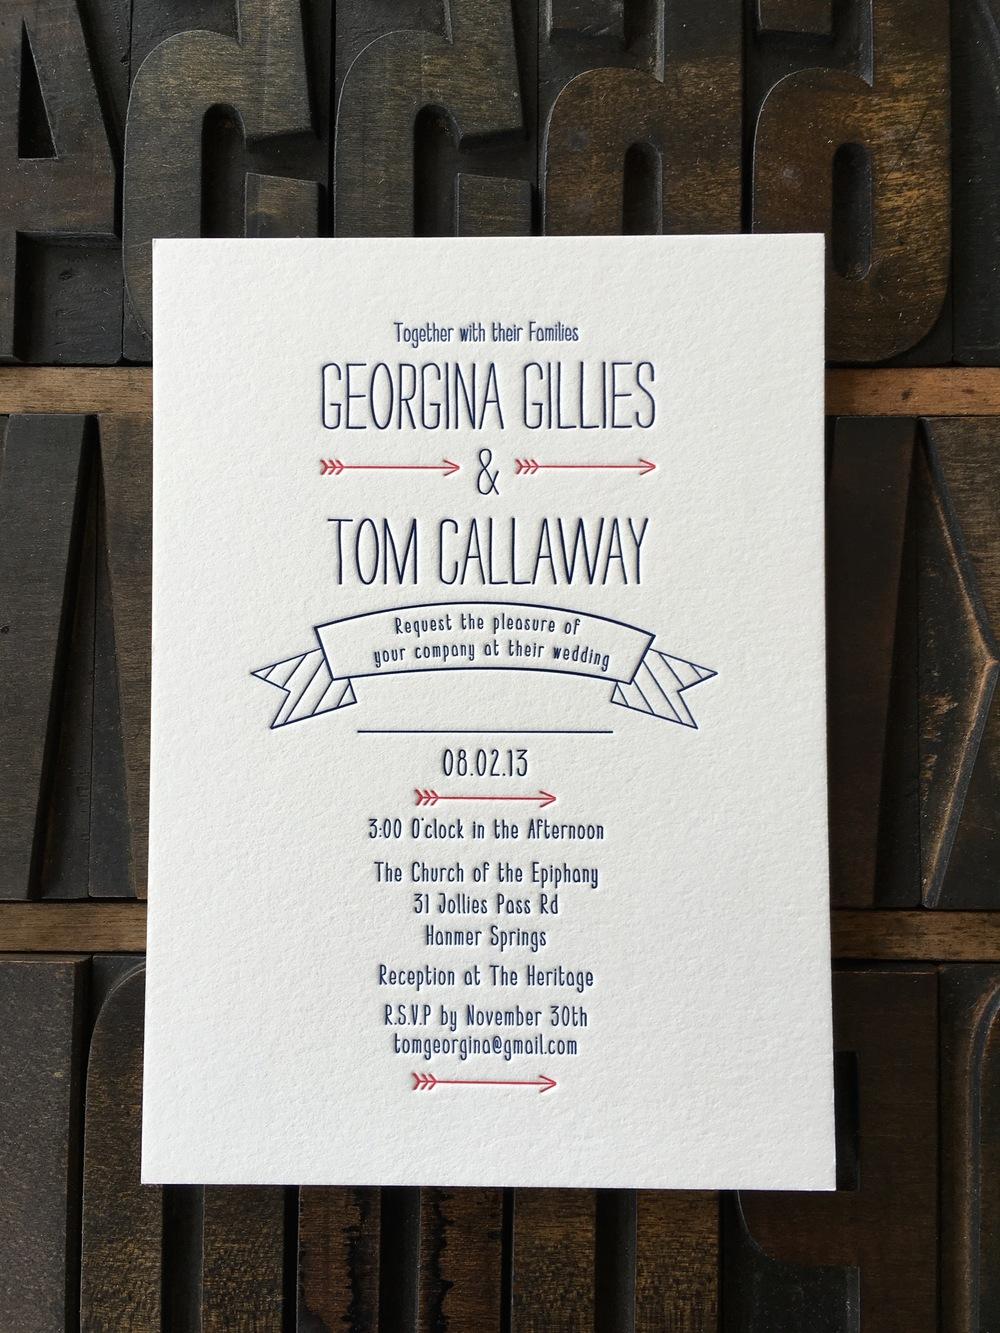 Georgina & Tom